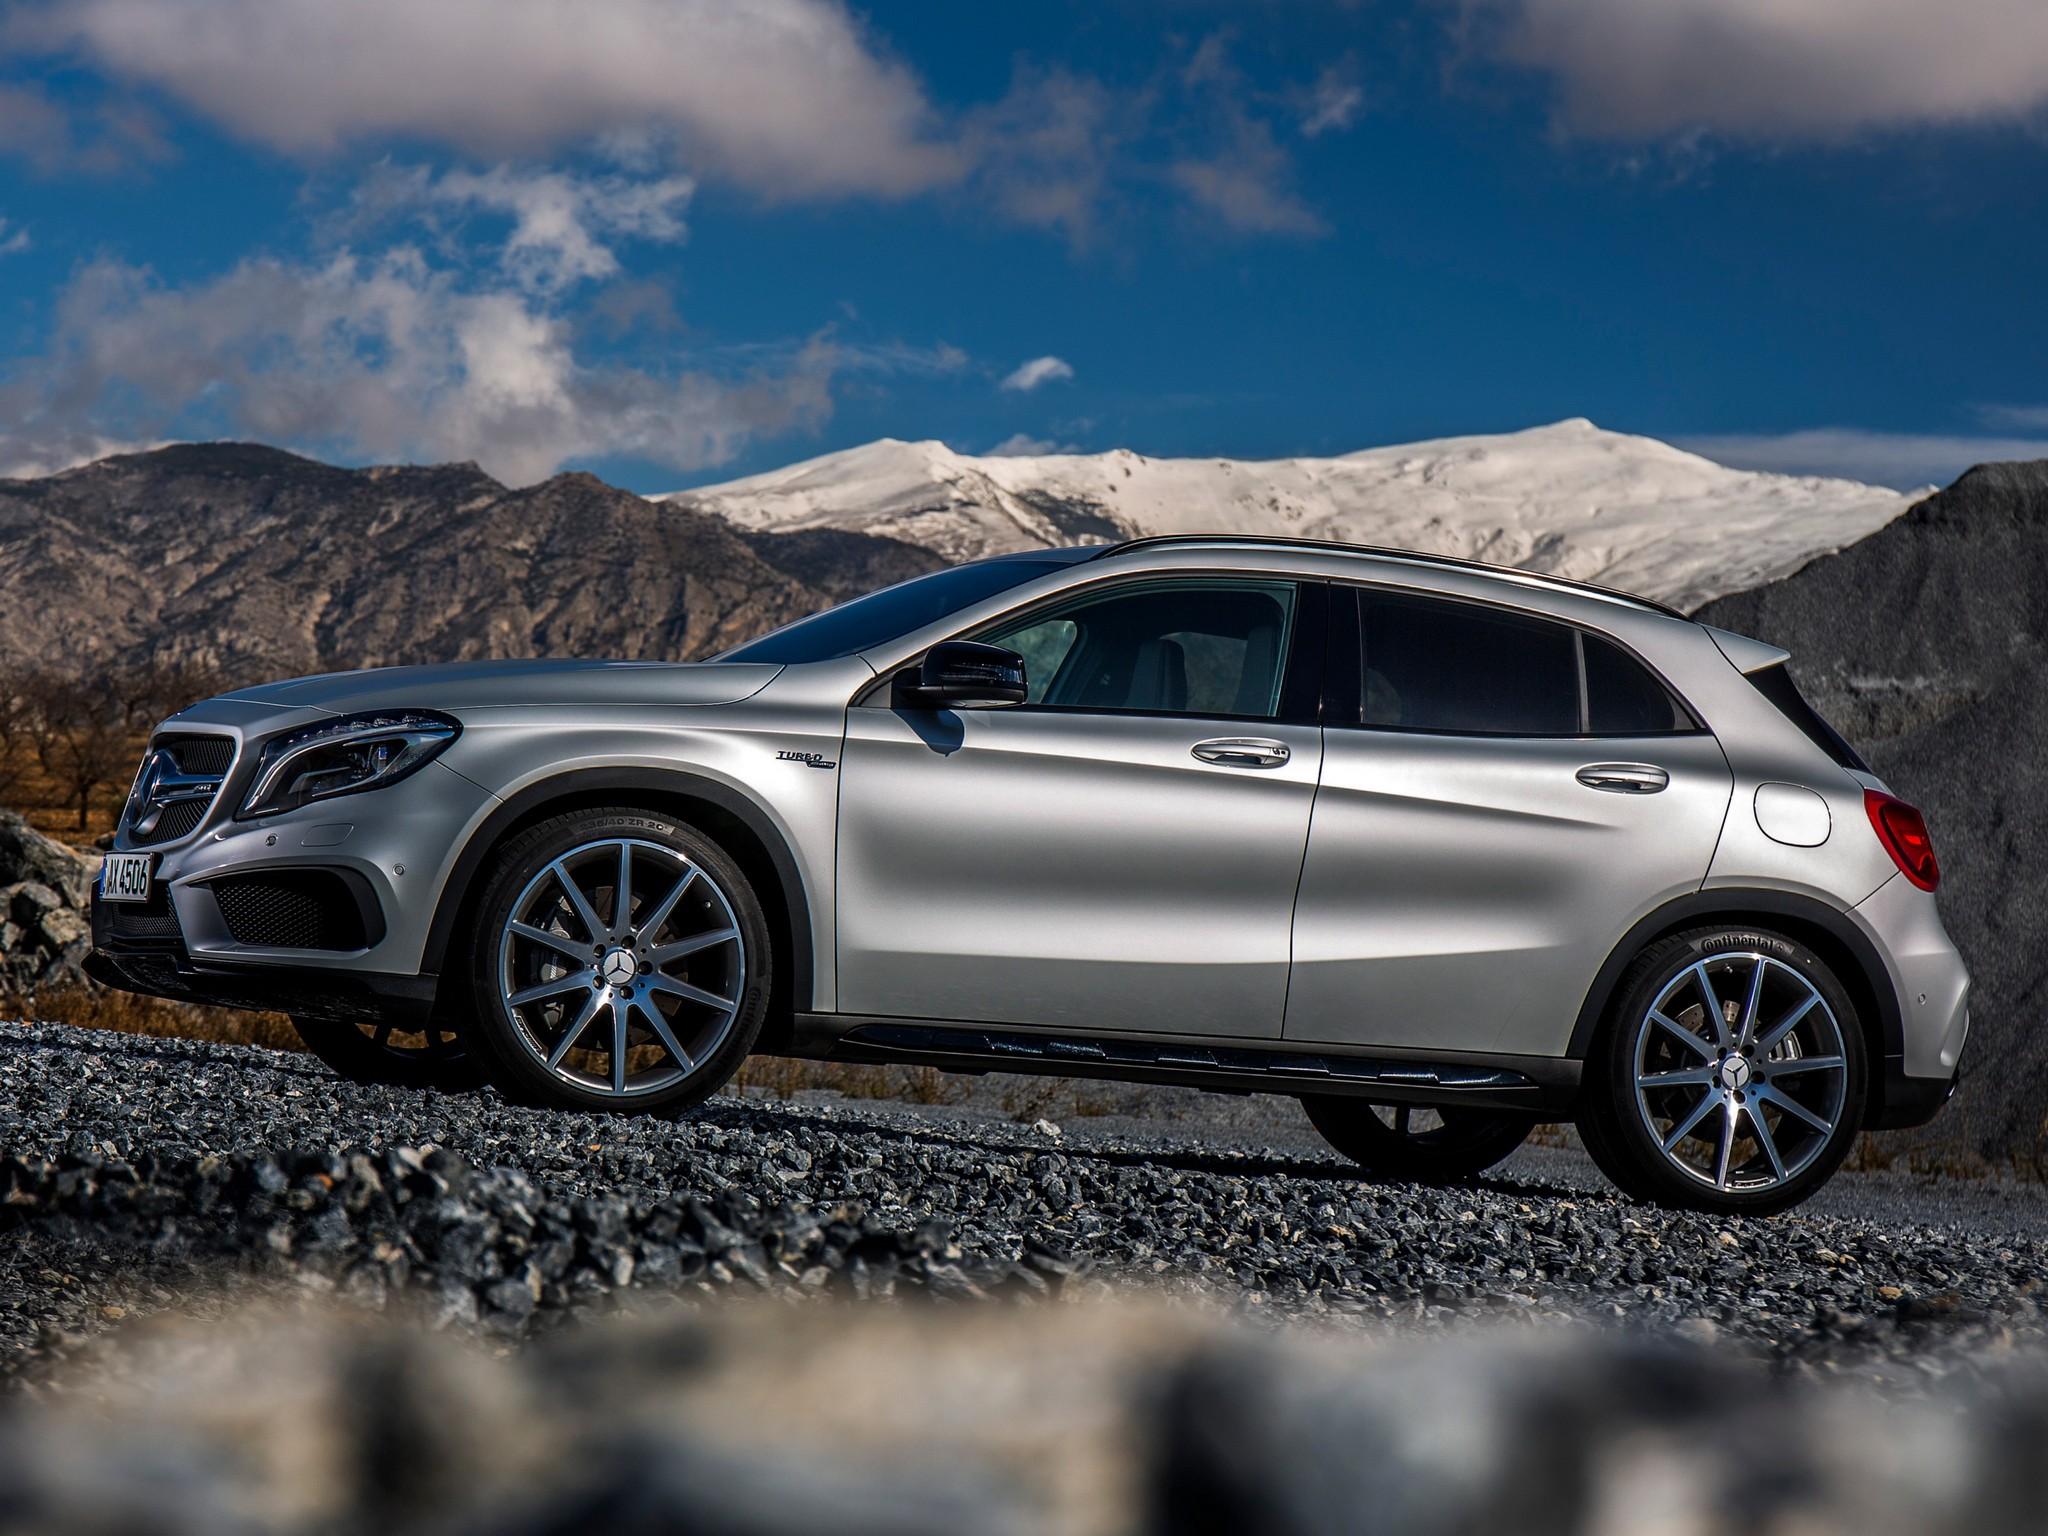 2017 Amg Gla 45 Mercedes Benz >> MERCEDES BENZ GLA 45 AMG - 2014, 2015, 2016, 2017 ...